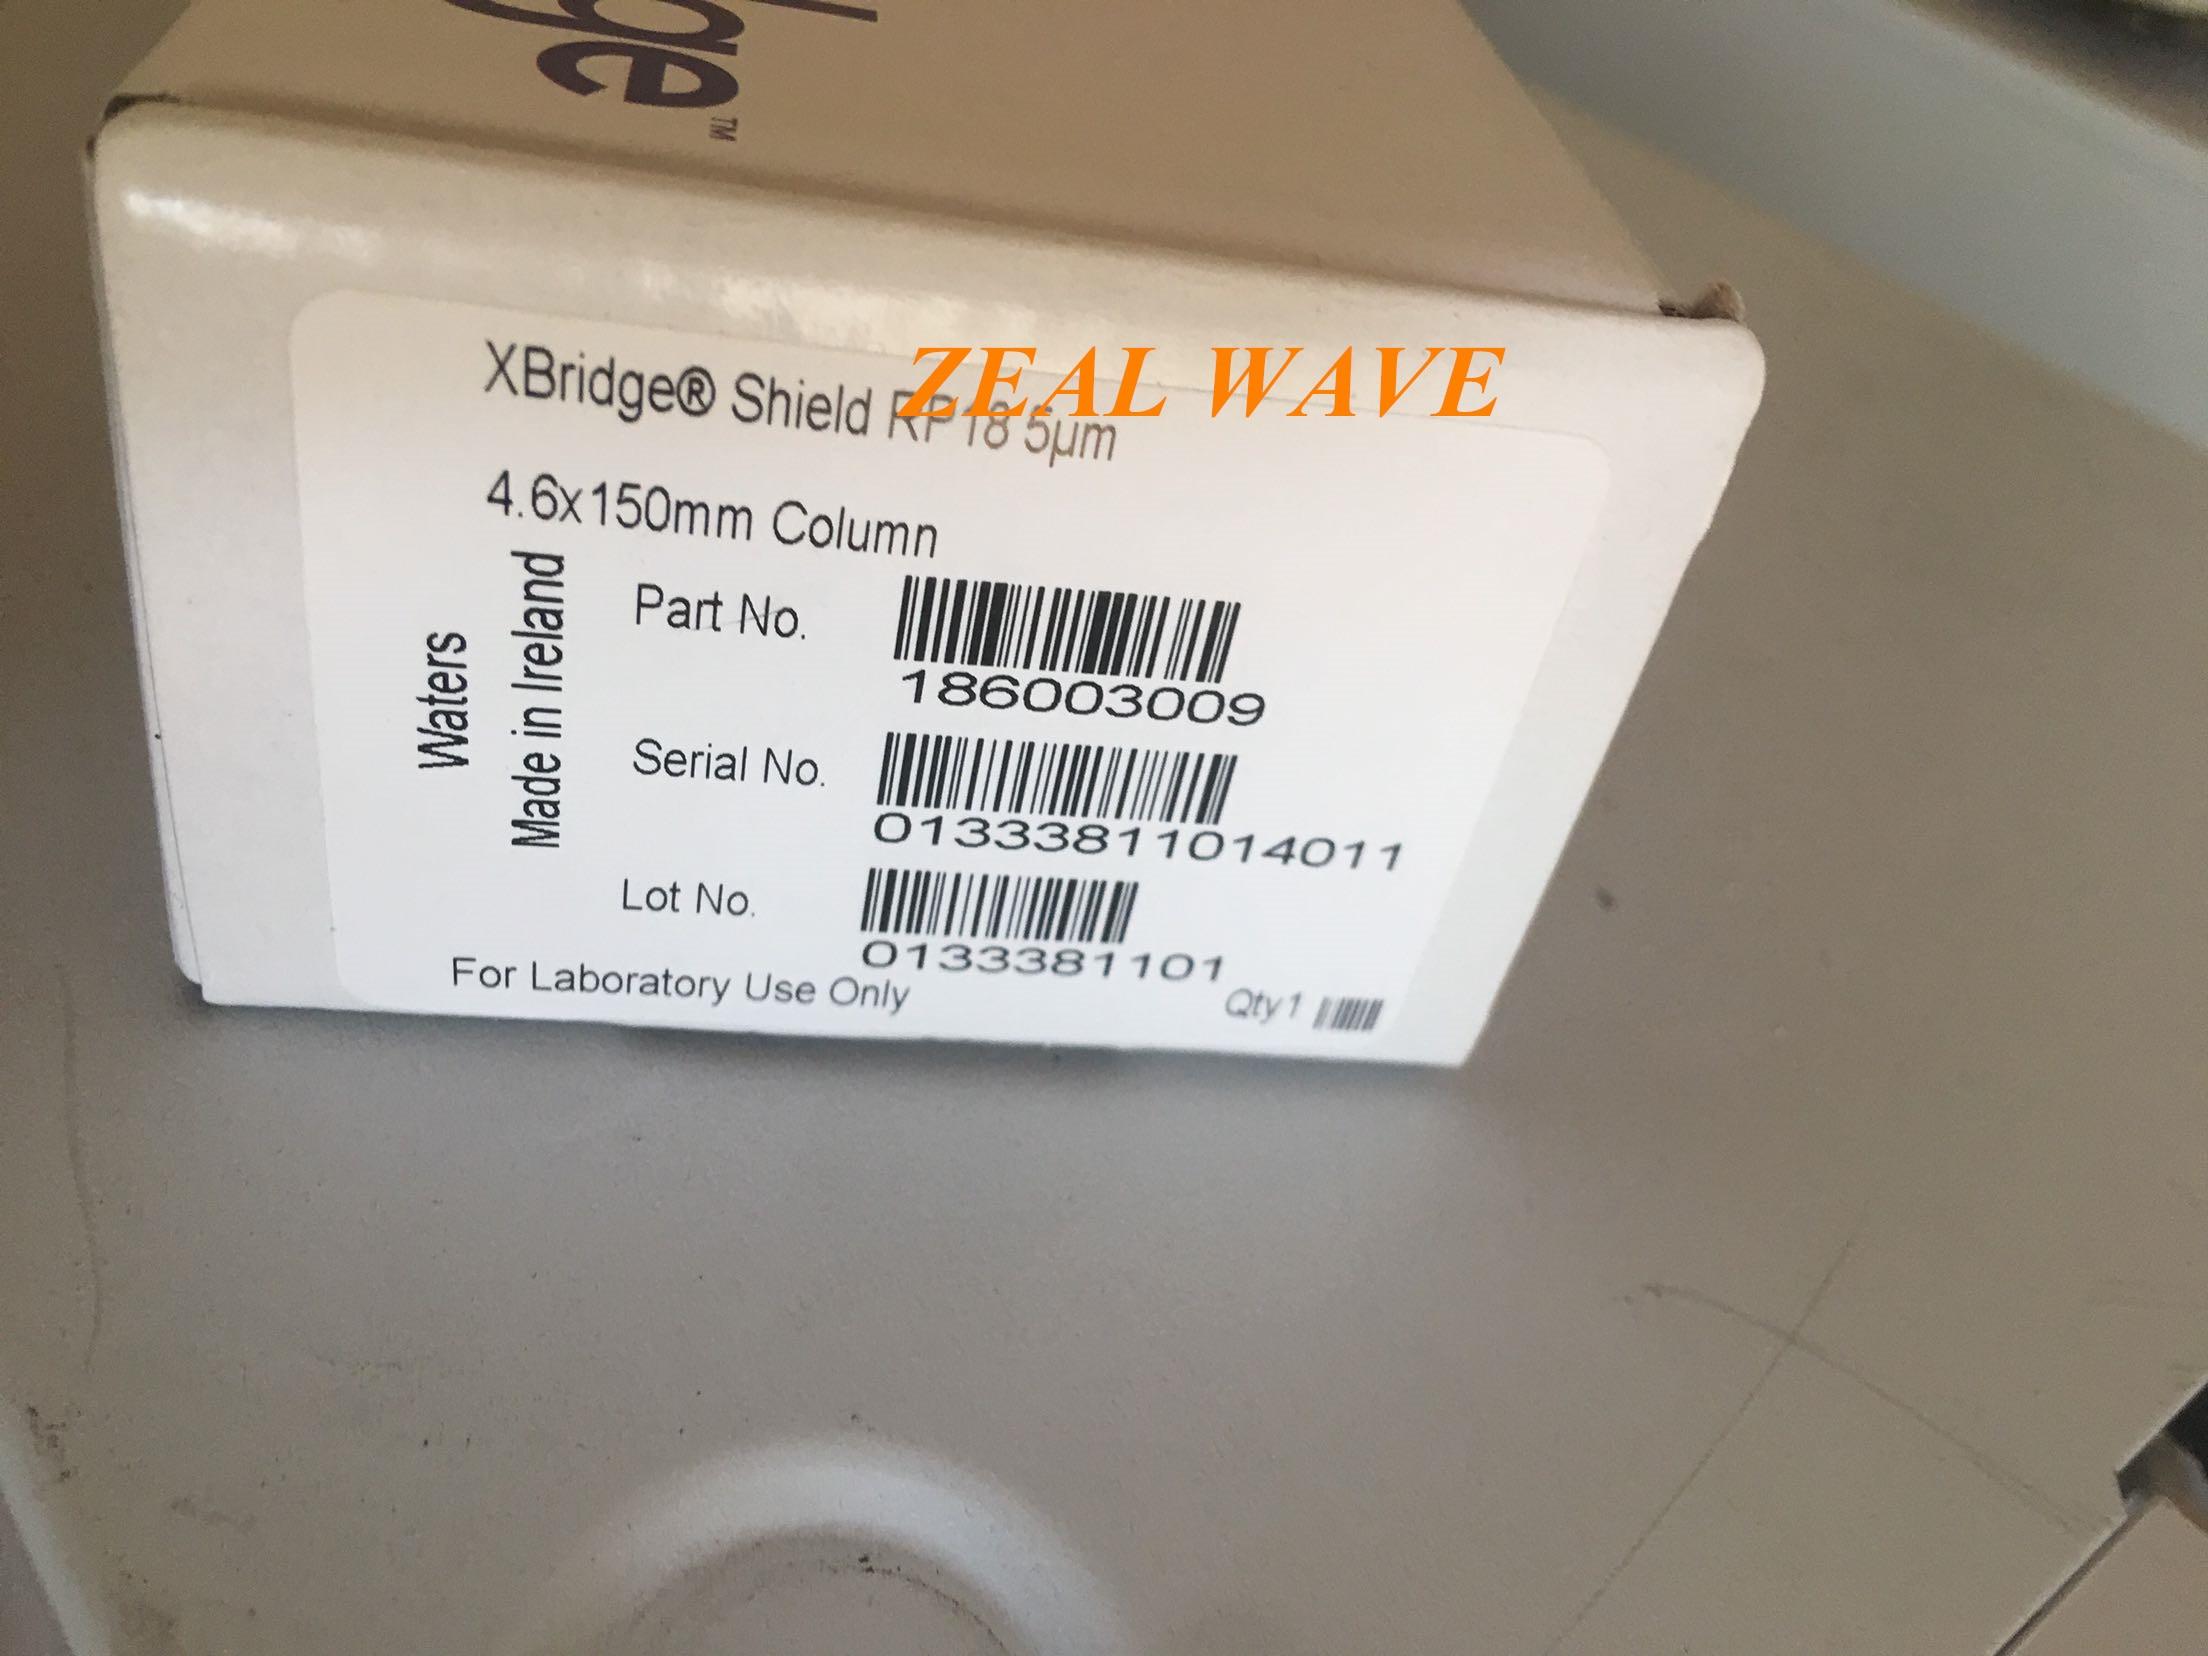 For Waters Original C18 Water Phase XBridge BEH RP18 4.6 * 150 Liquid Chromatography Column 186003009